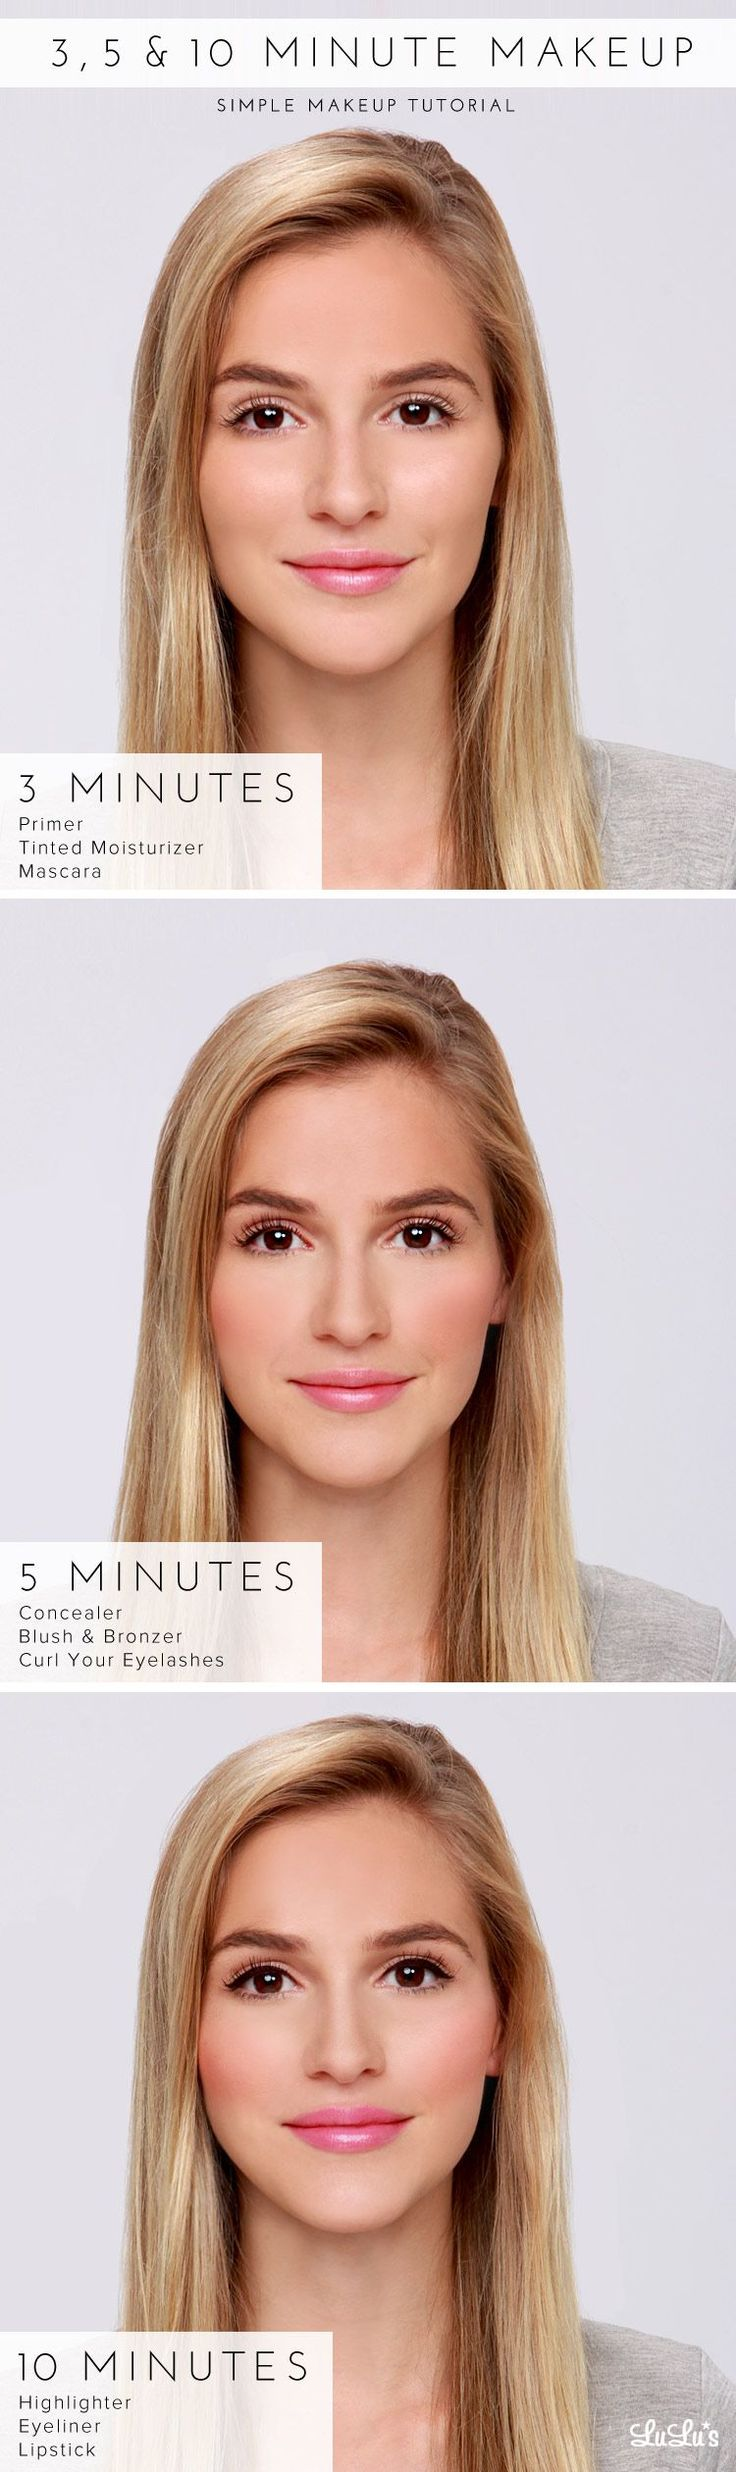 3, 5 & 10 Minute Makeup Tutorial / lulus.com